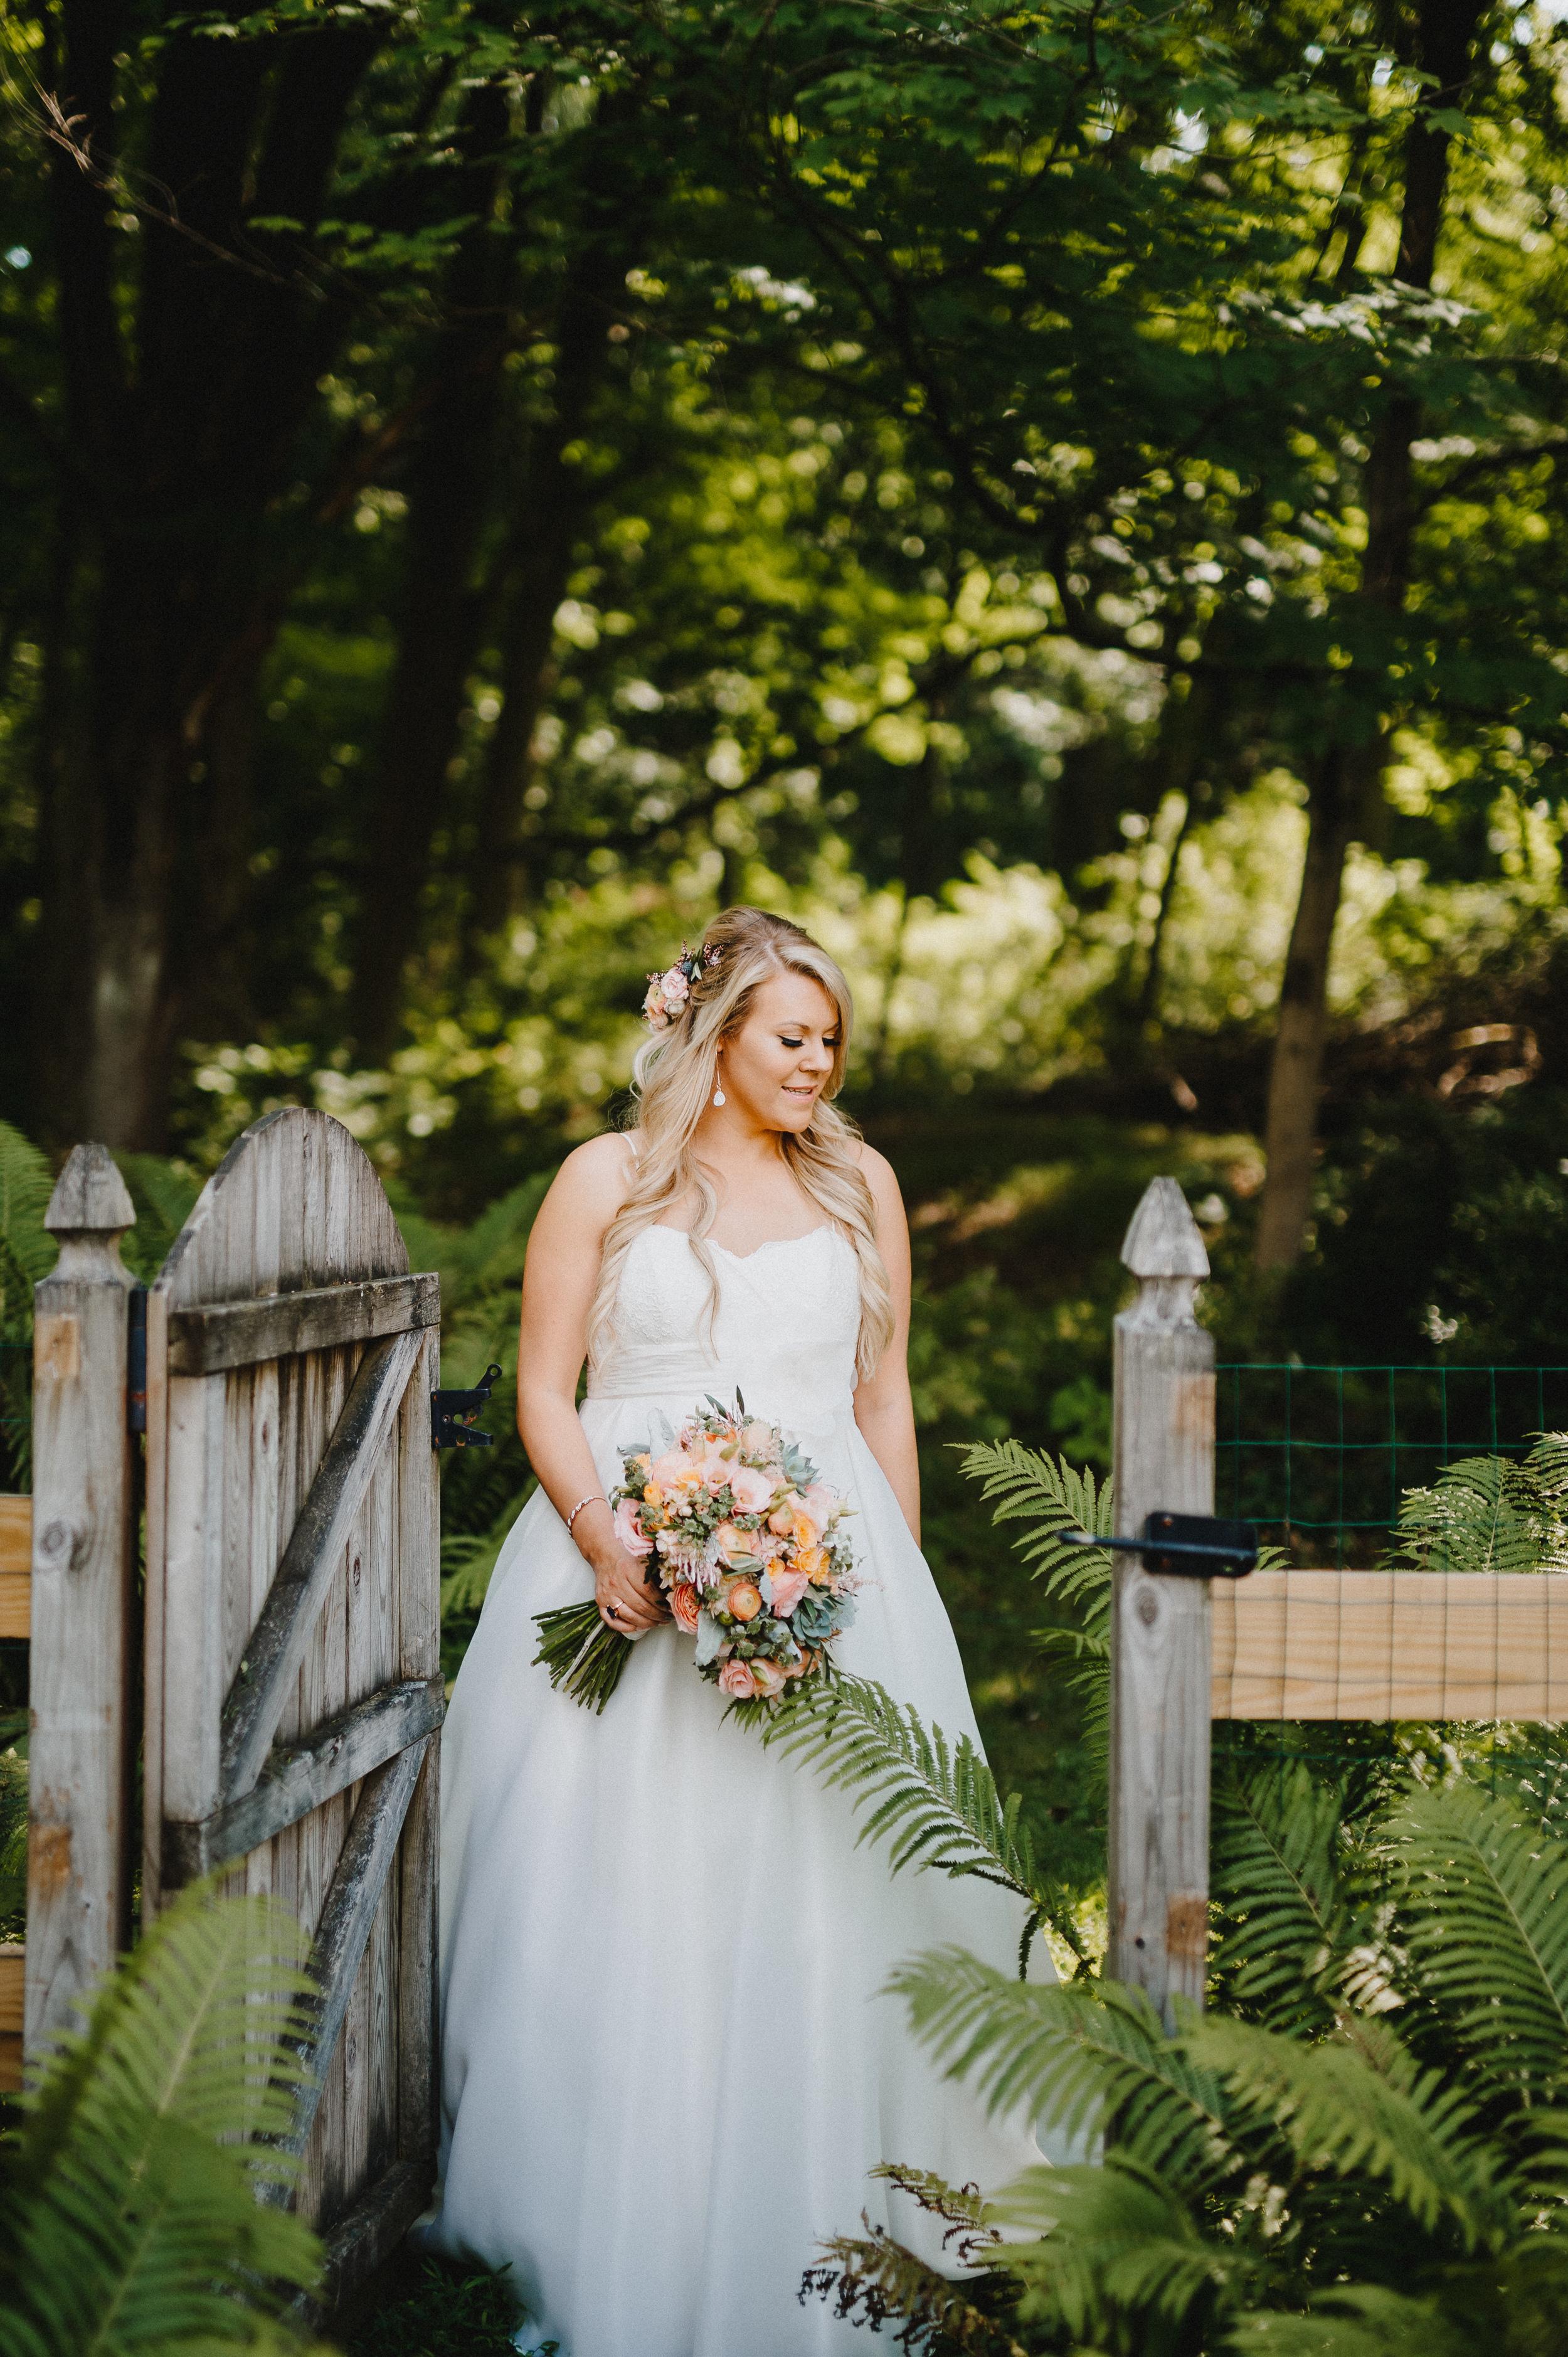 holly-hedge-estate-wedding-photographer-pat-robinson-photography-36.jpg